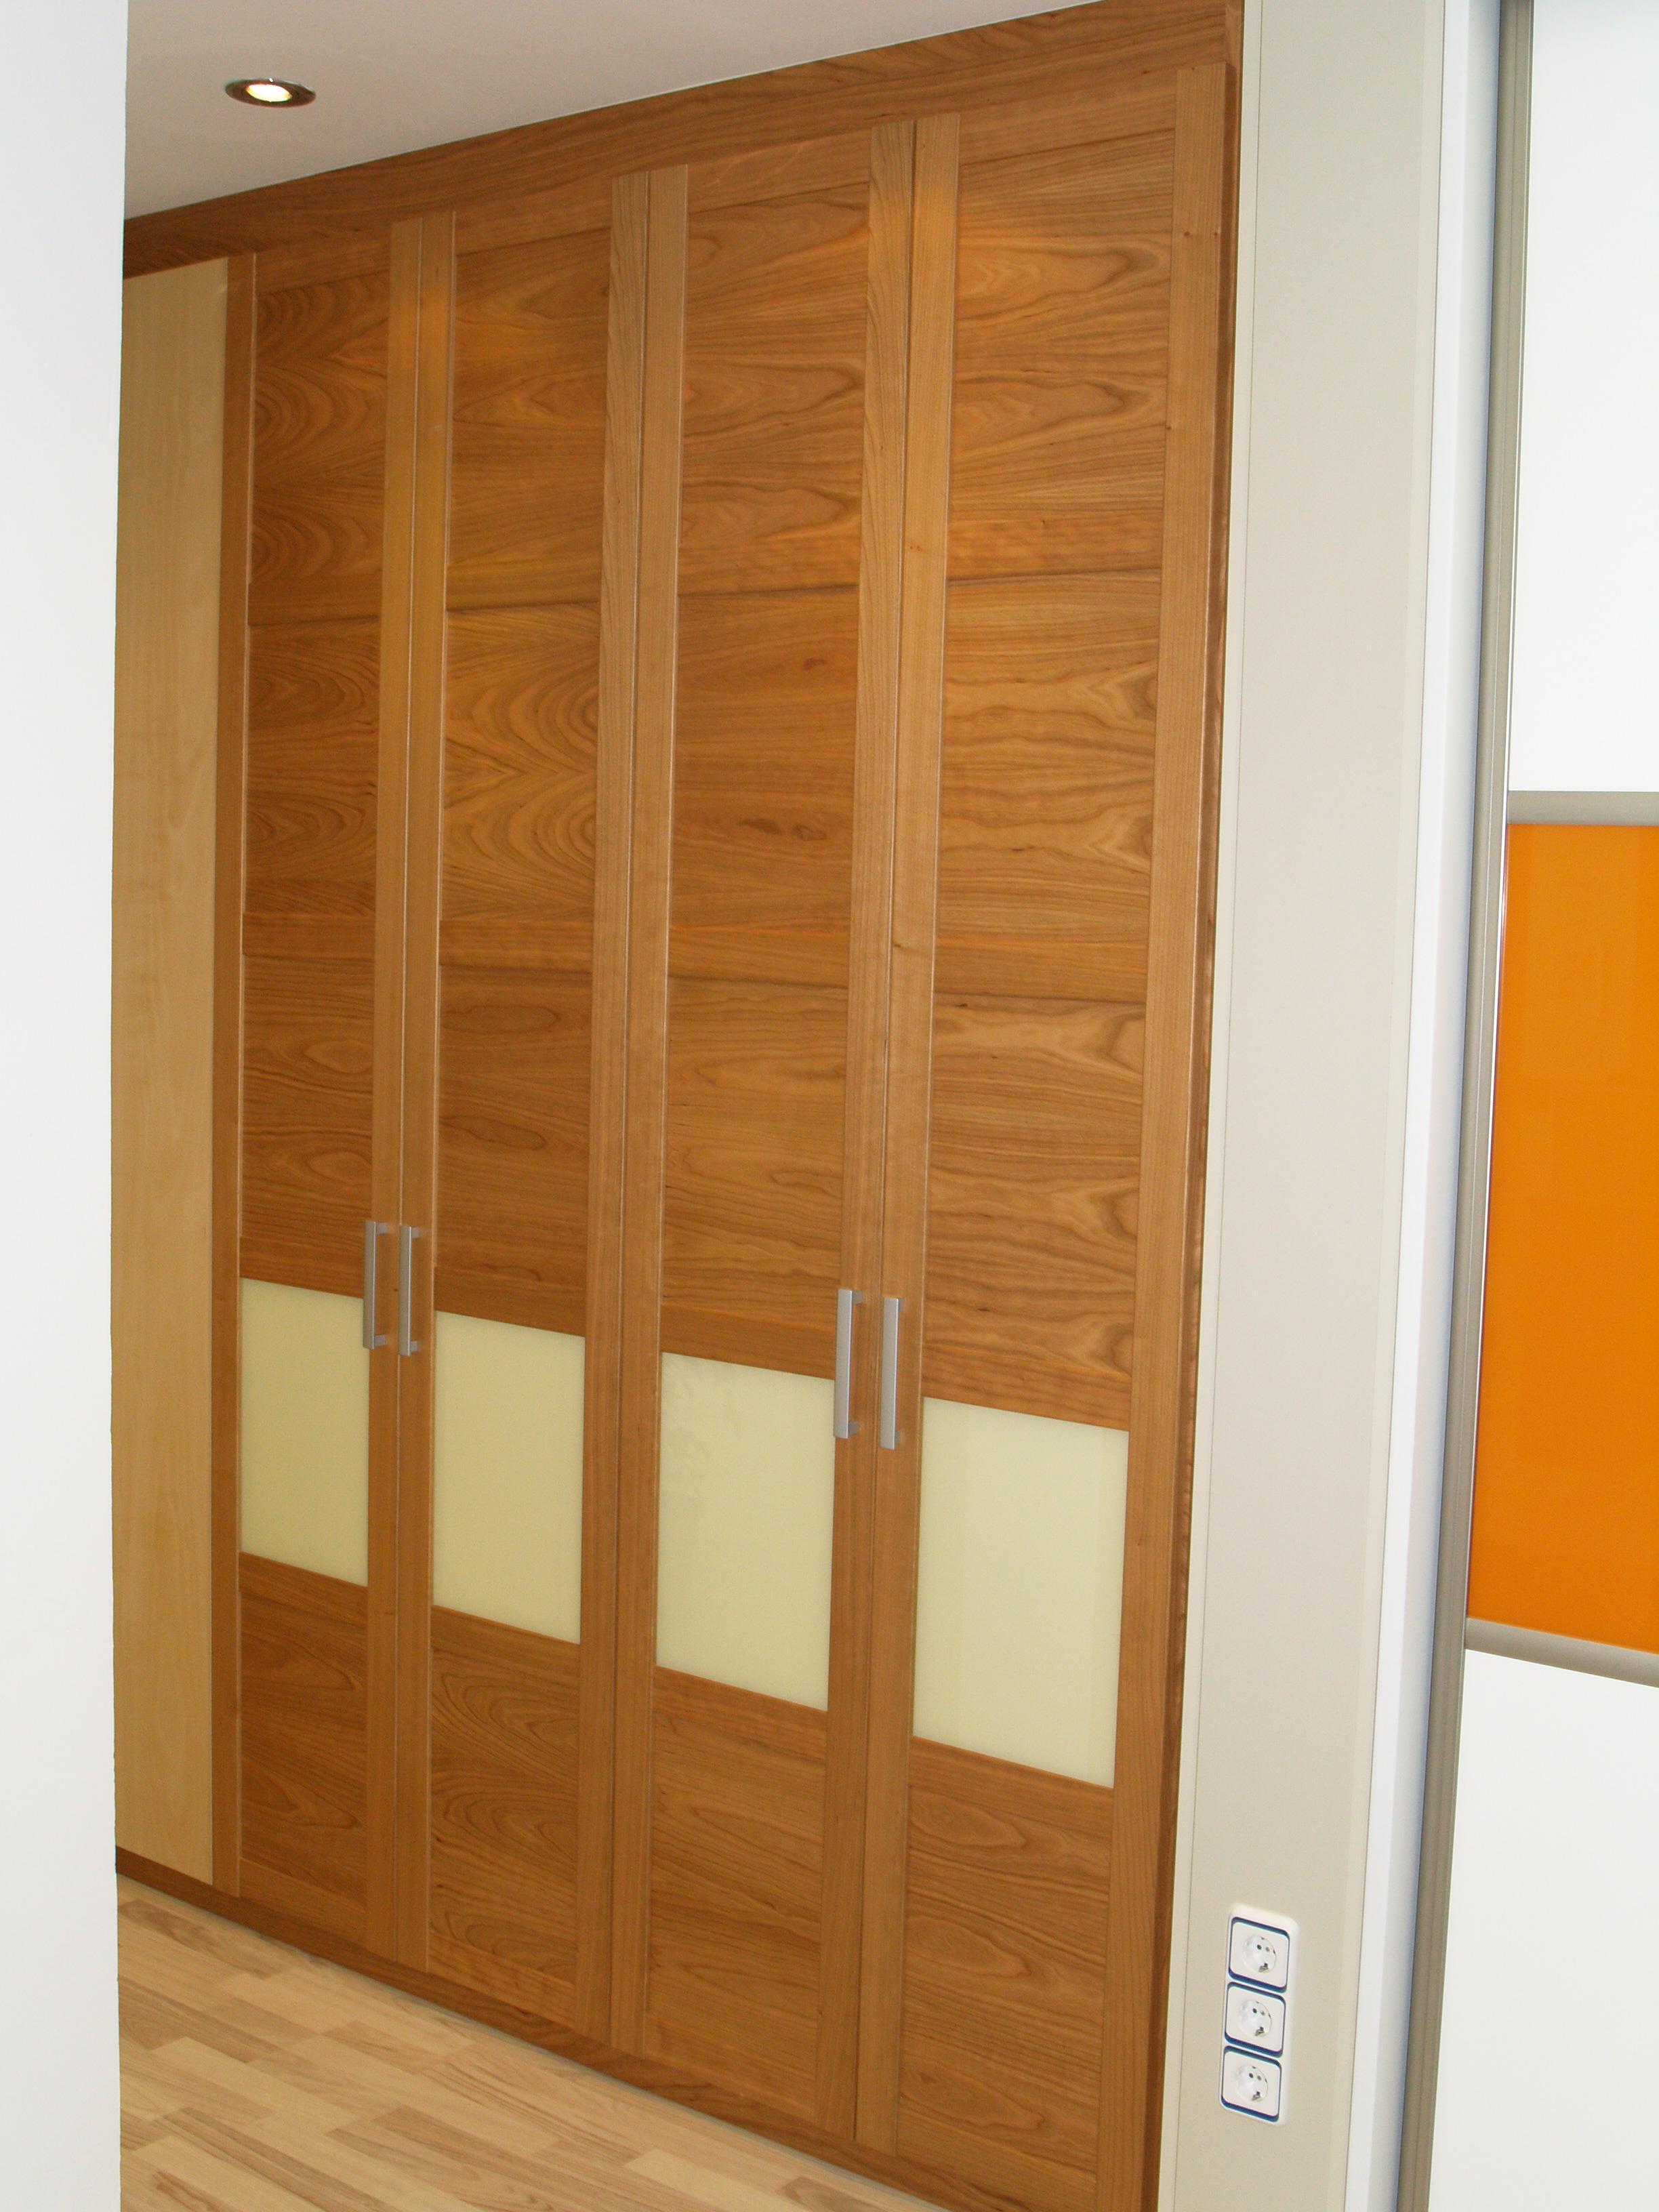 Armarios empotrados con puertas correderas o abatibles - Puertas de armarios empotrados ...